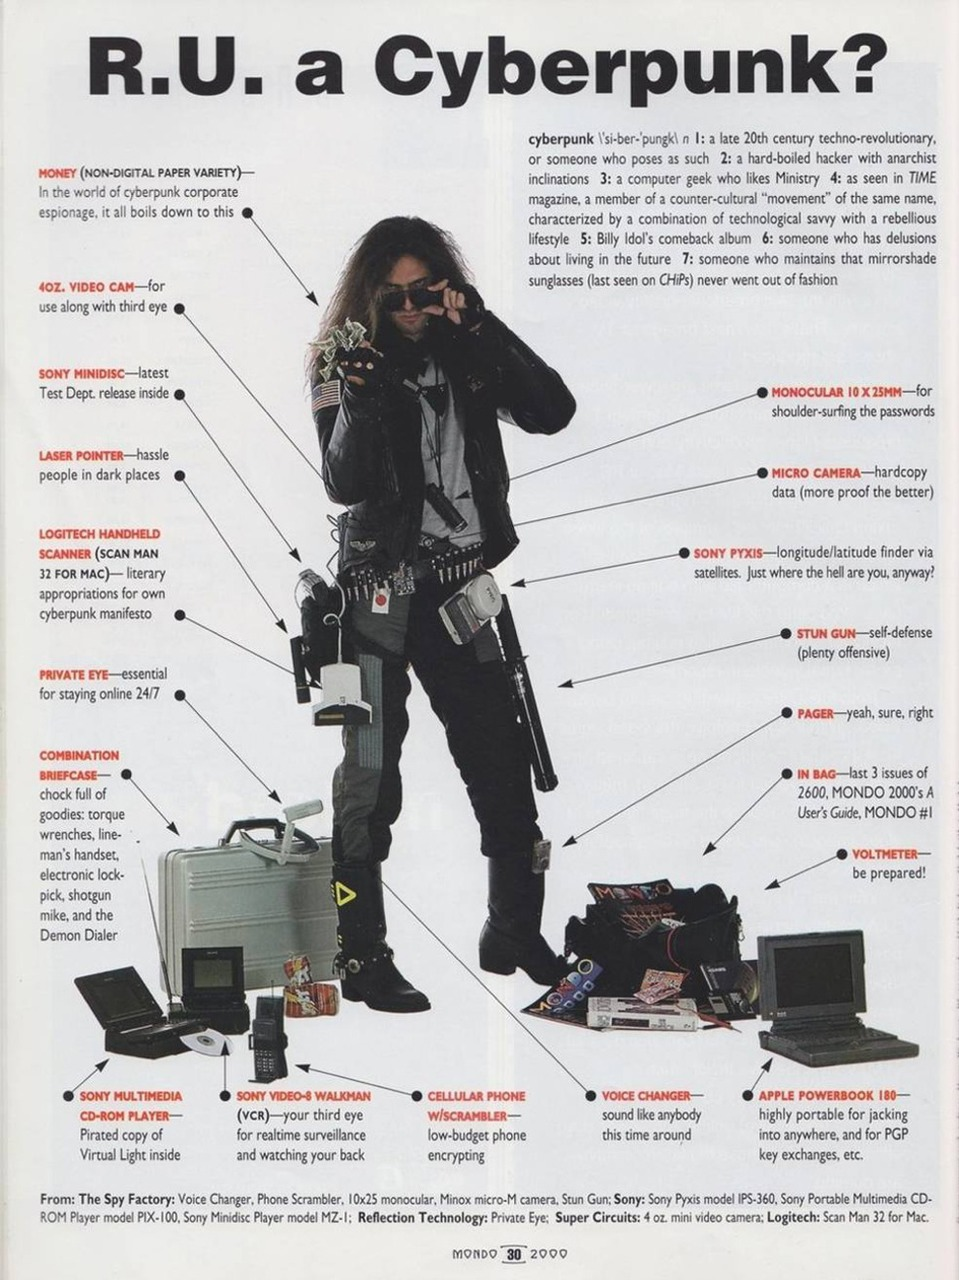 sfadj: R.U. a Cyberpunk? Yes.